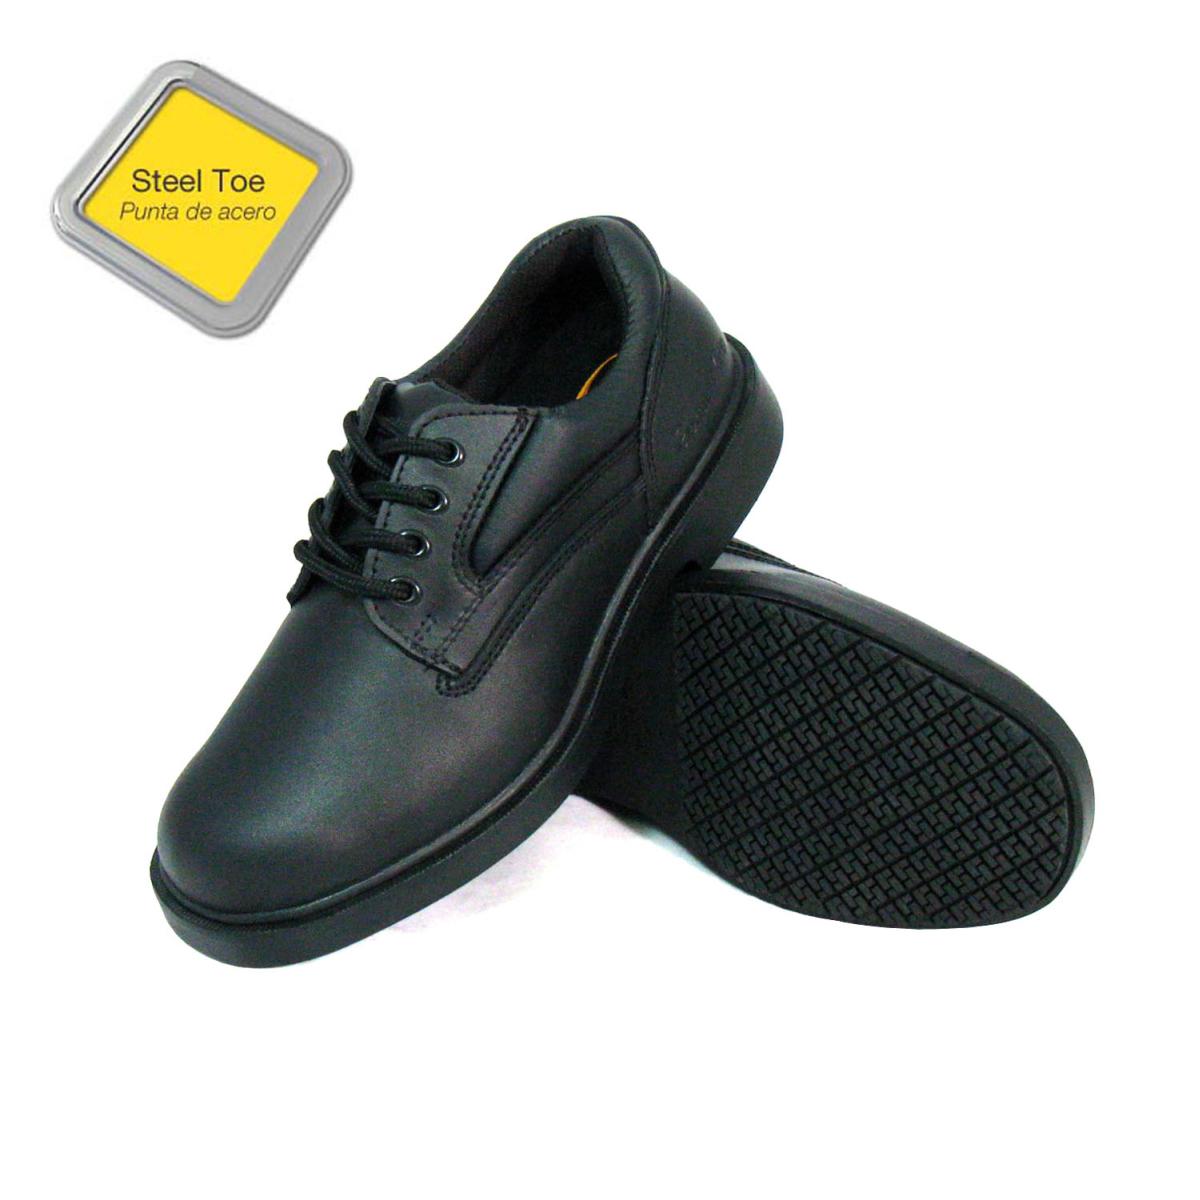 Steel Toe Metatarsal Dress Shoes